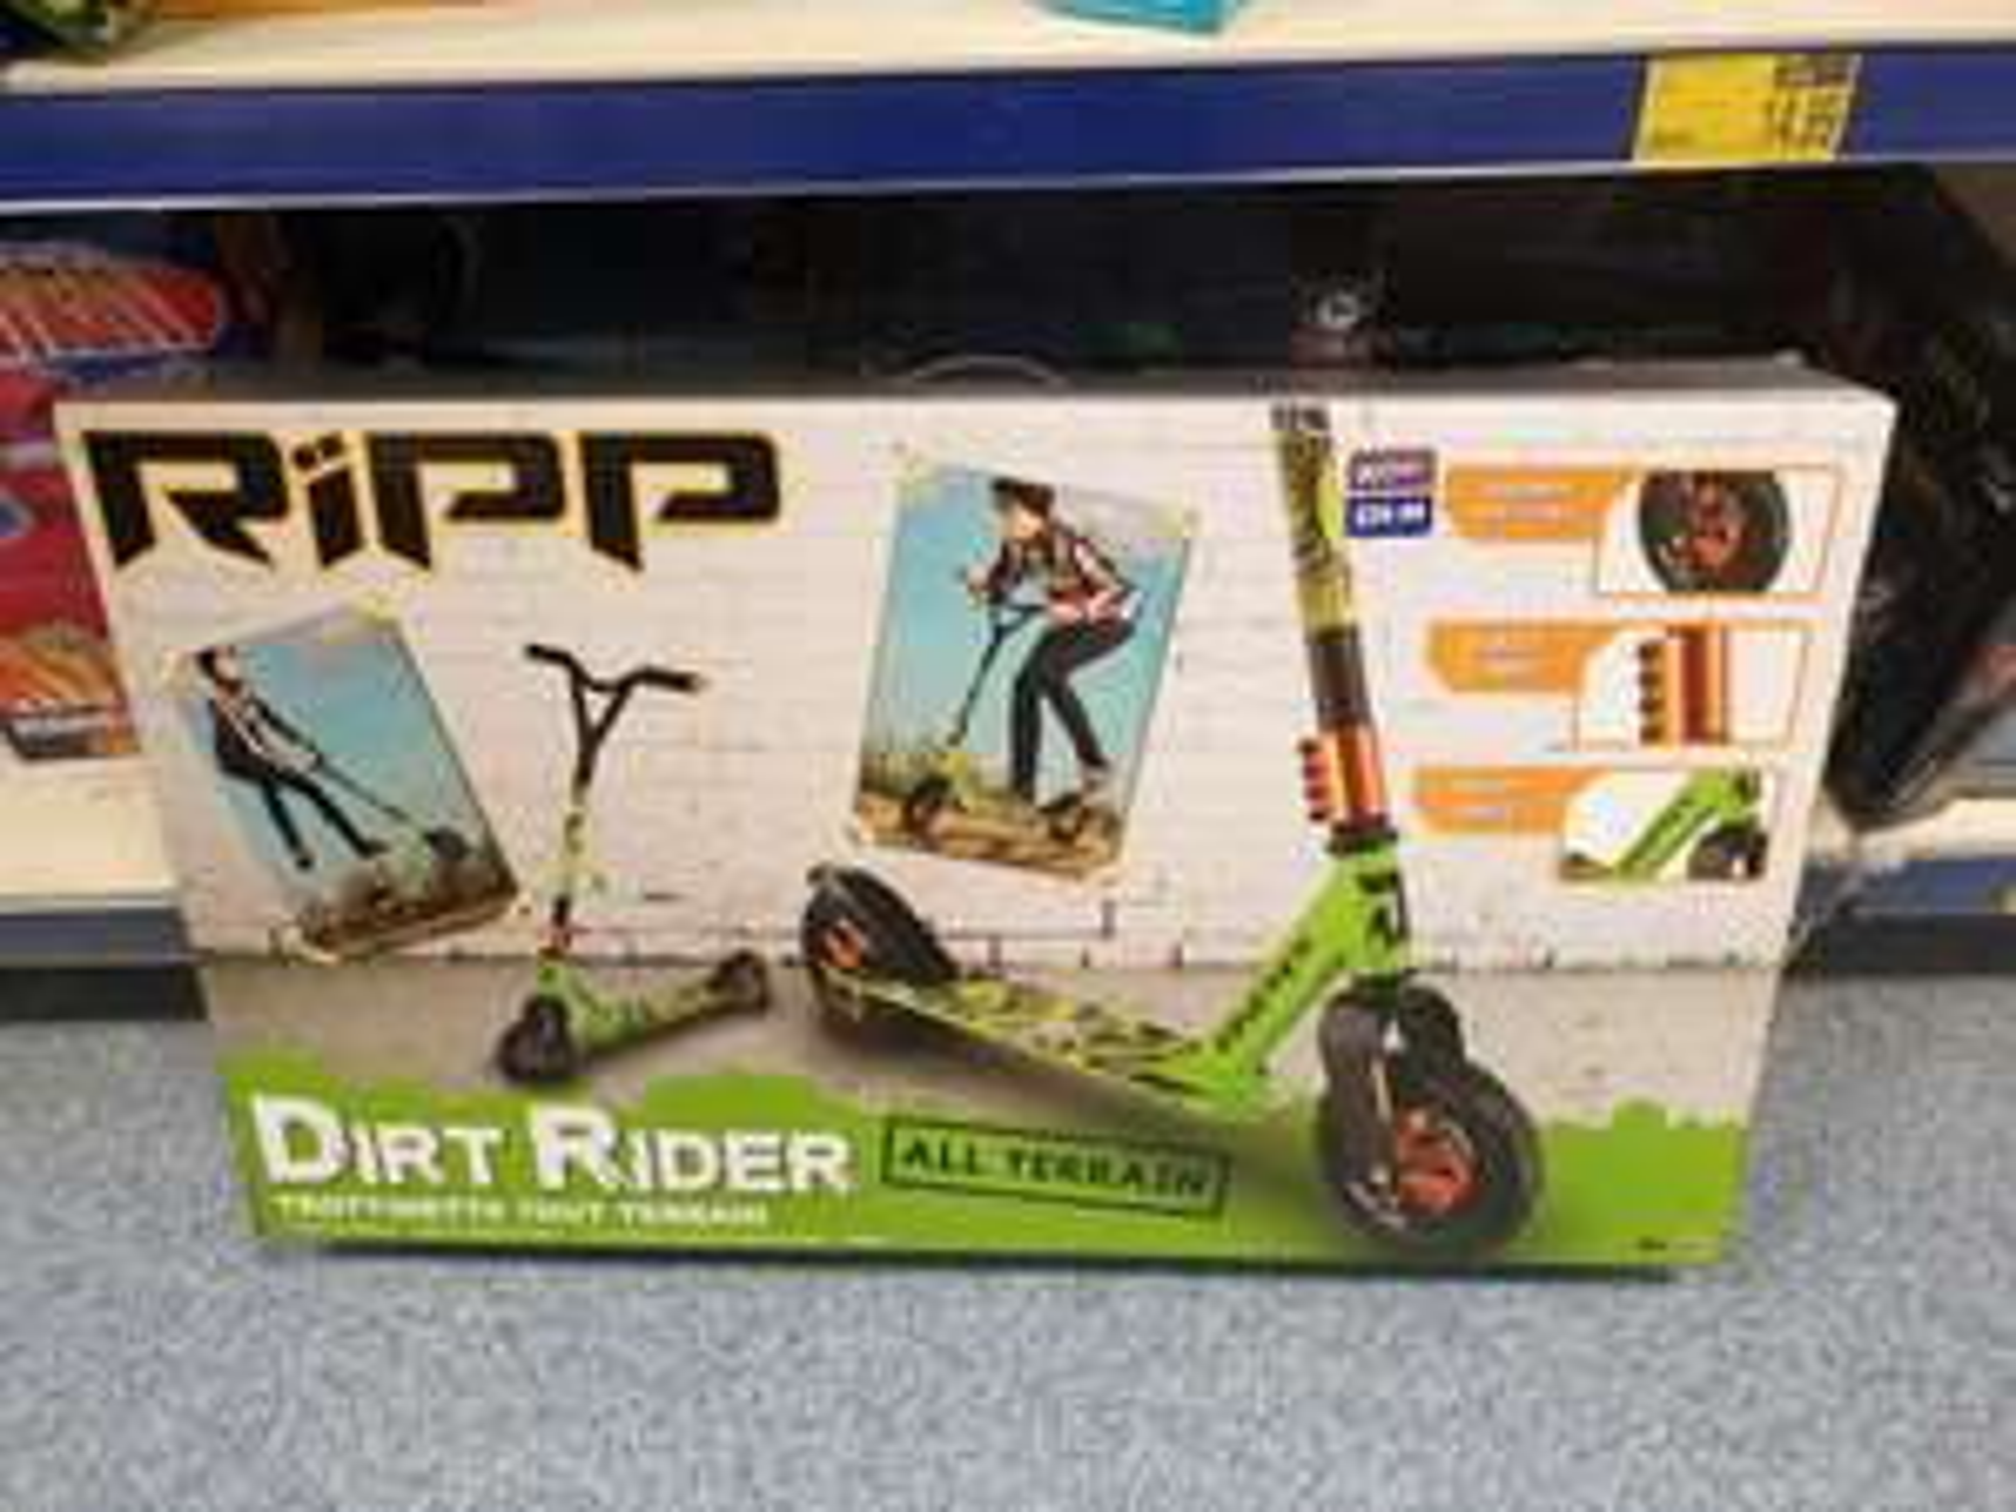 RIPP Dirt Rider Terrain Scooter Stunt Scooter £39.99 instore @ B&M Lakeside